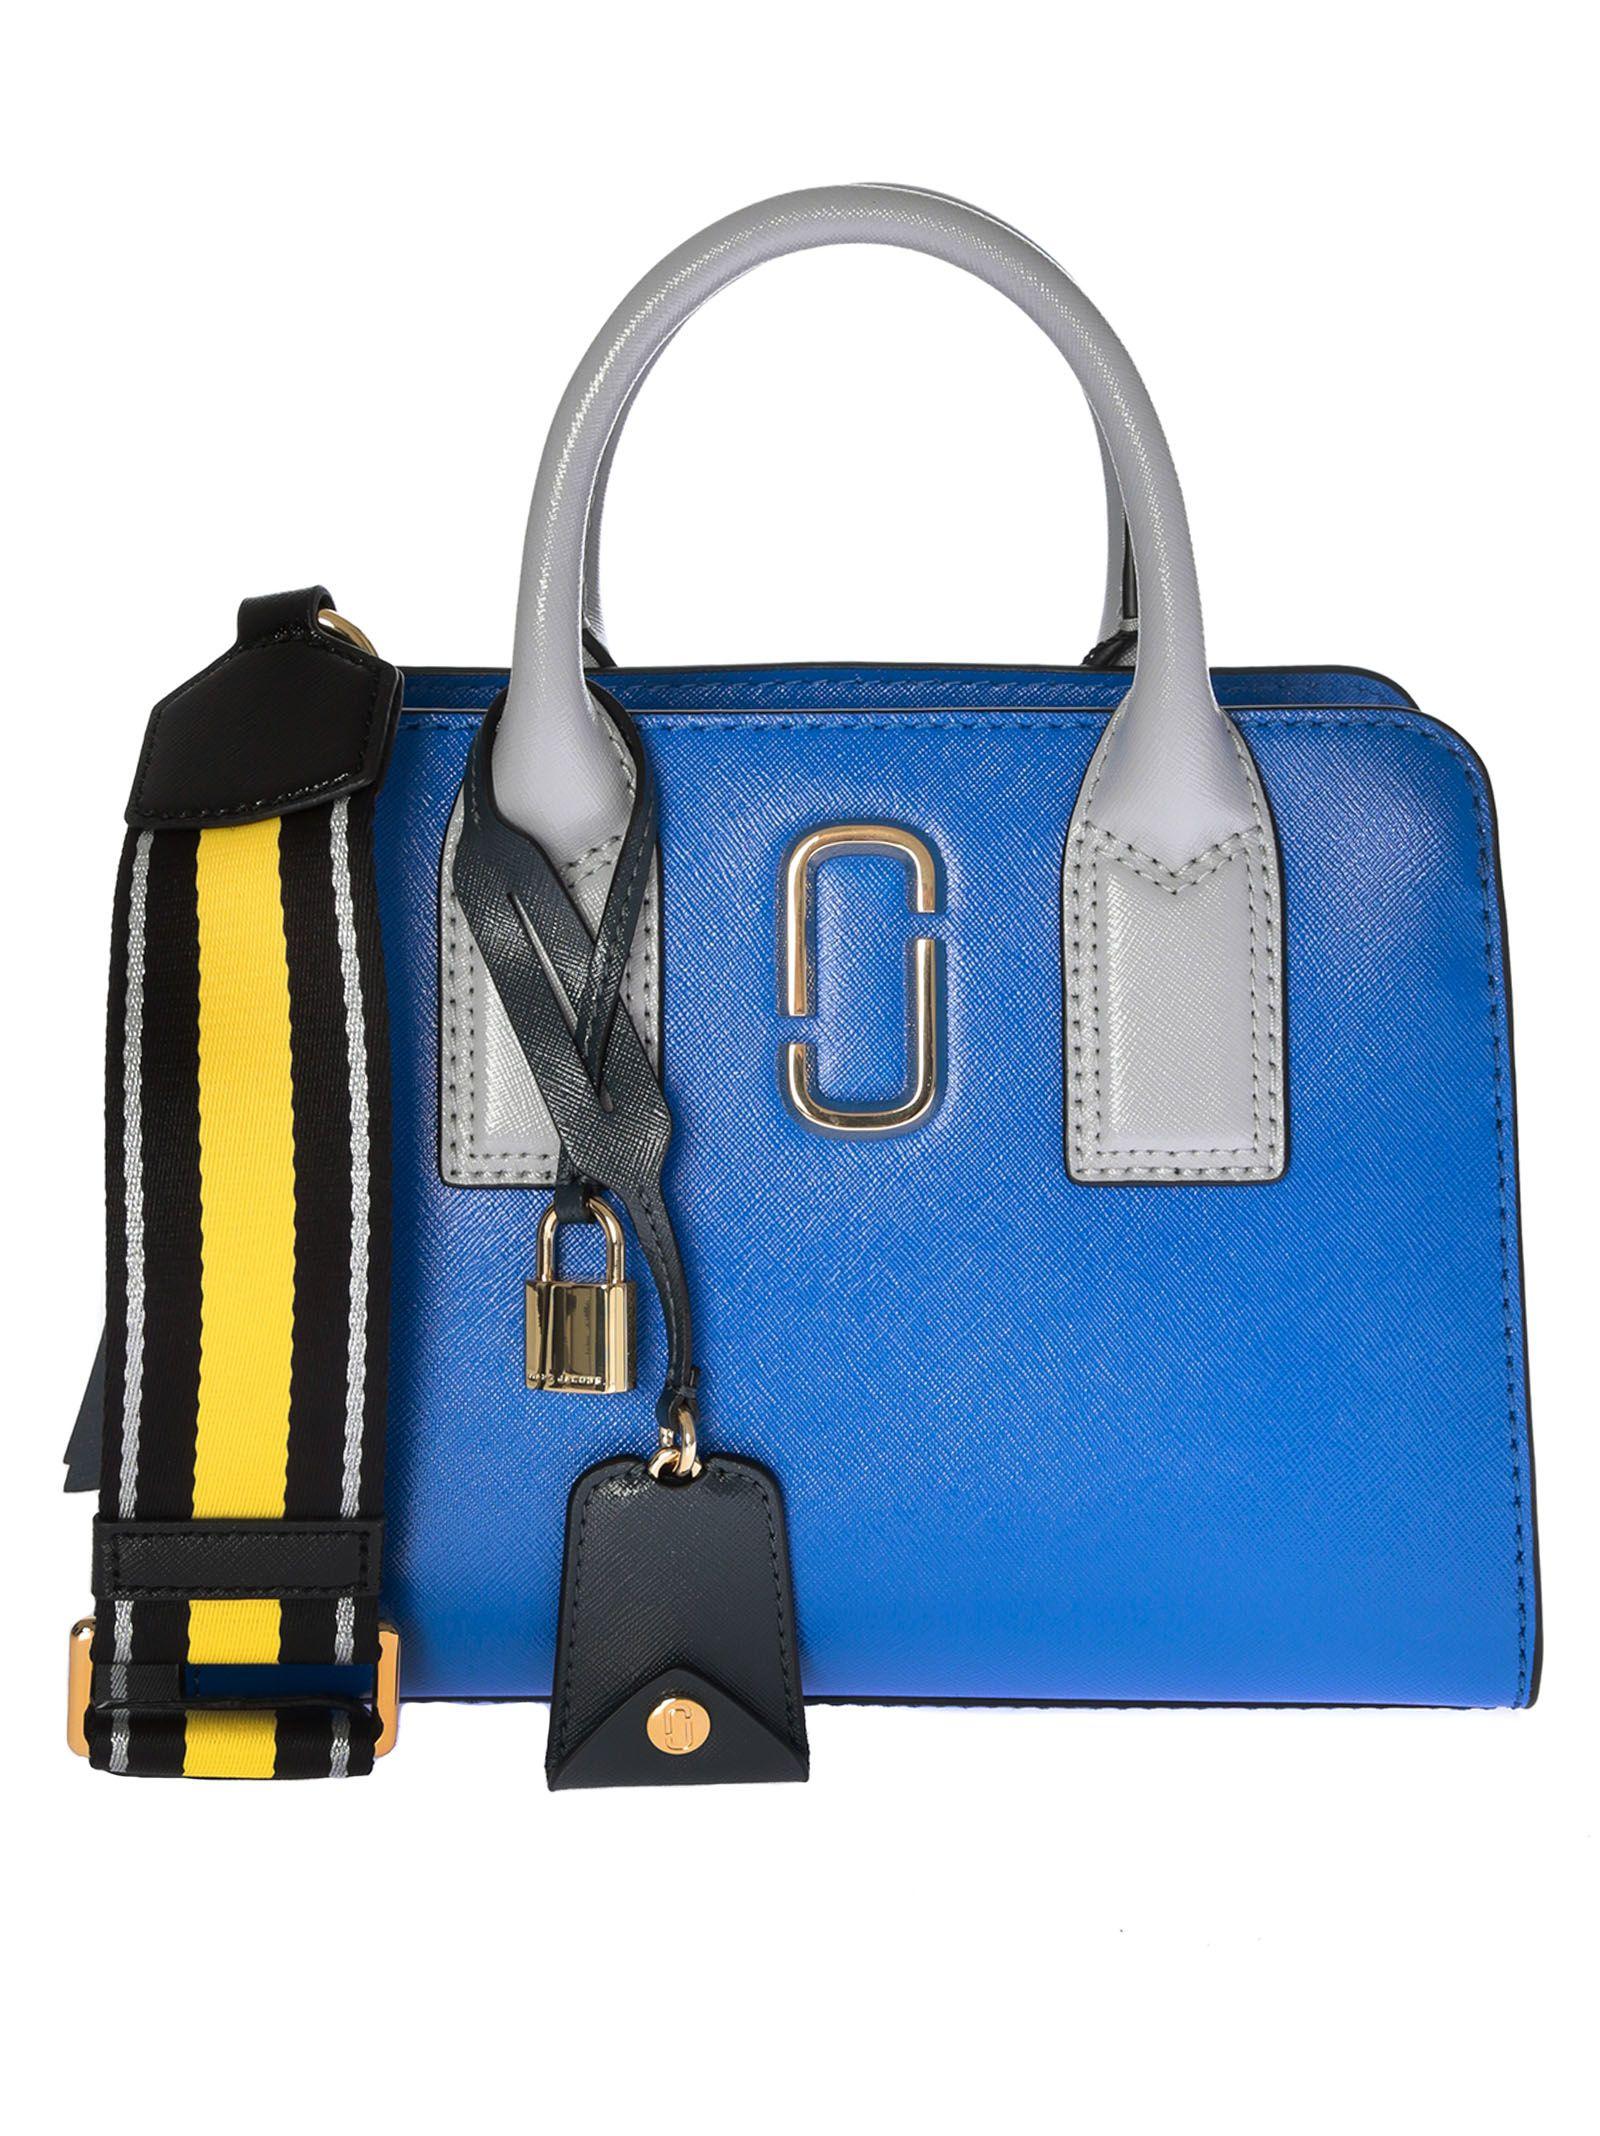 edbd0771a074 Marc by Marc Jacobs Marc Jacobs Snapshot Shoulder Bag - 10798387 ...